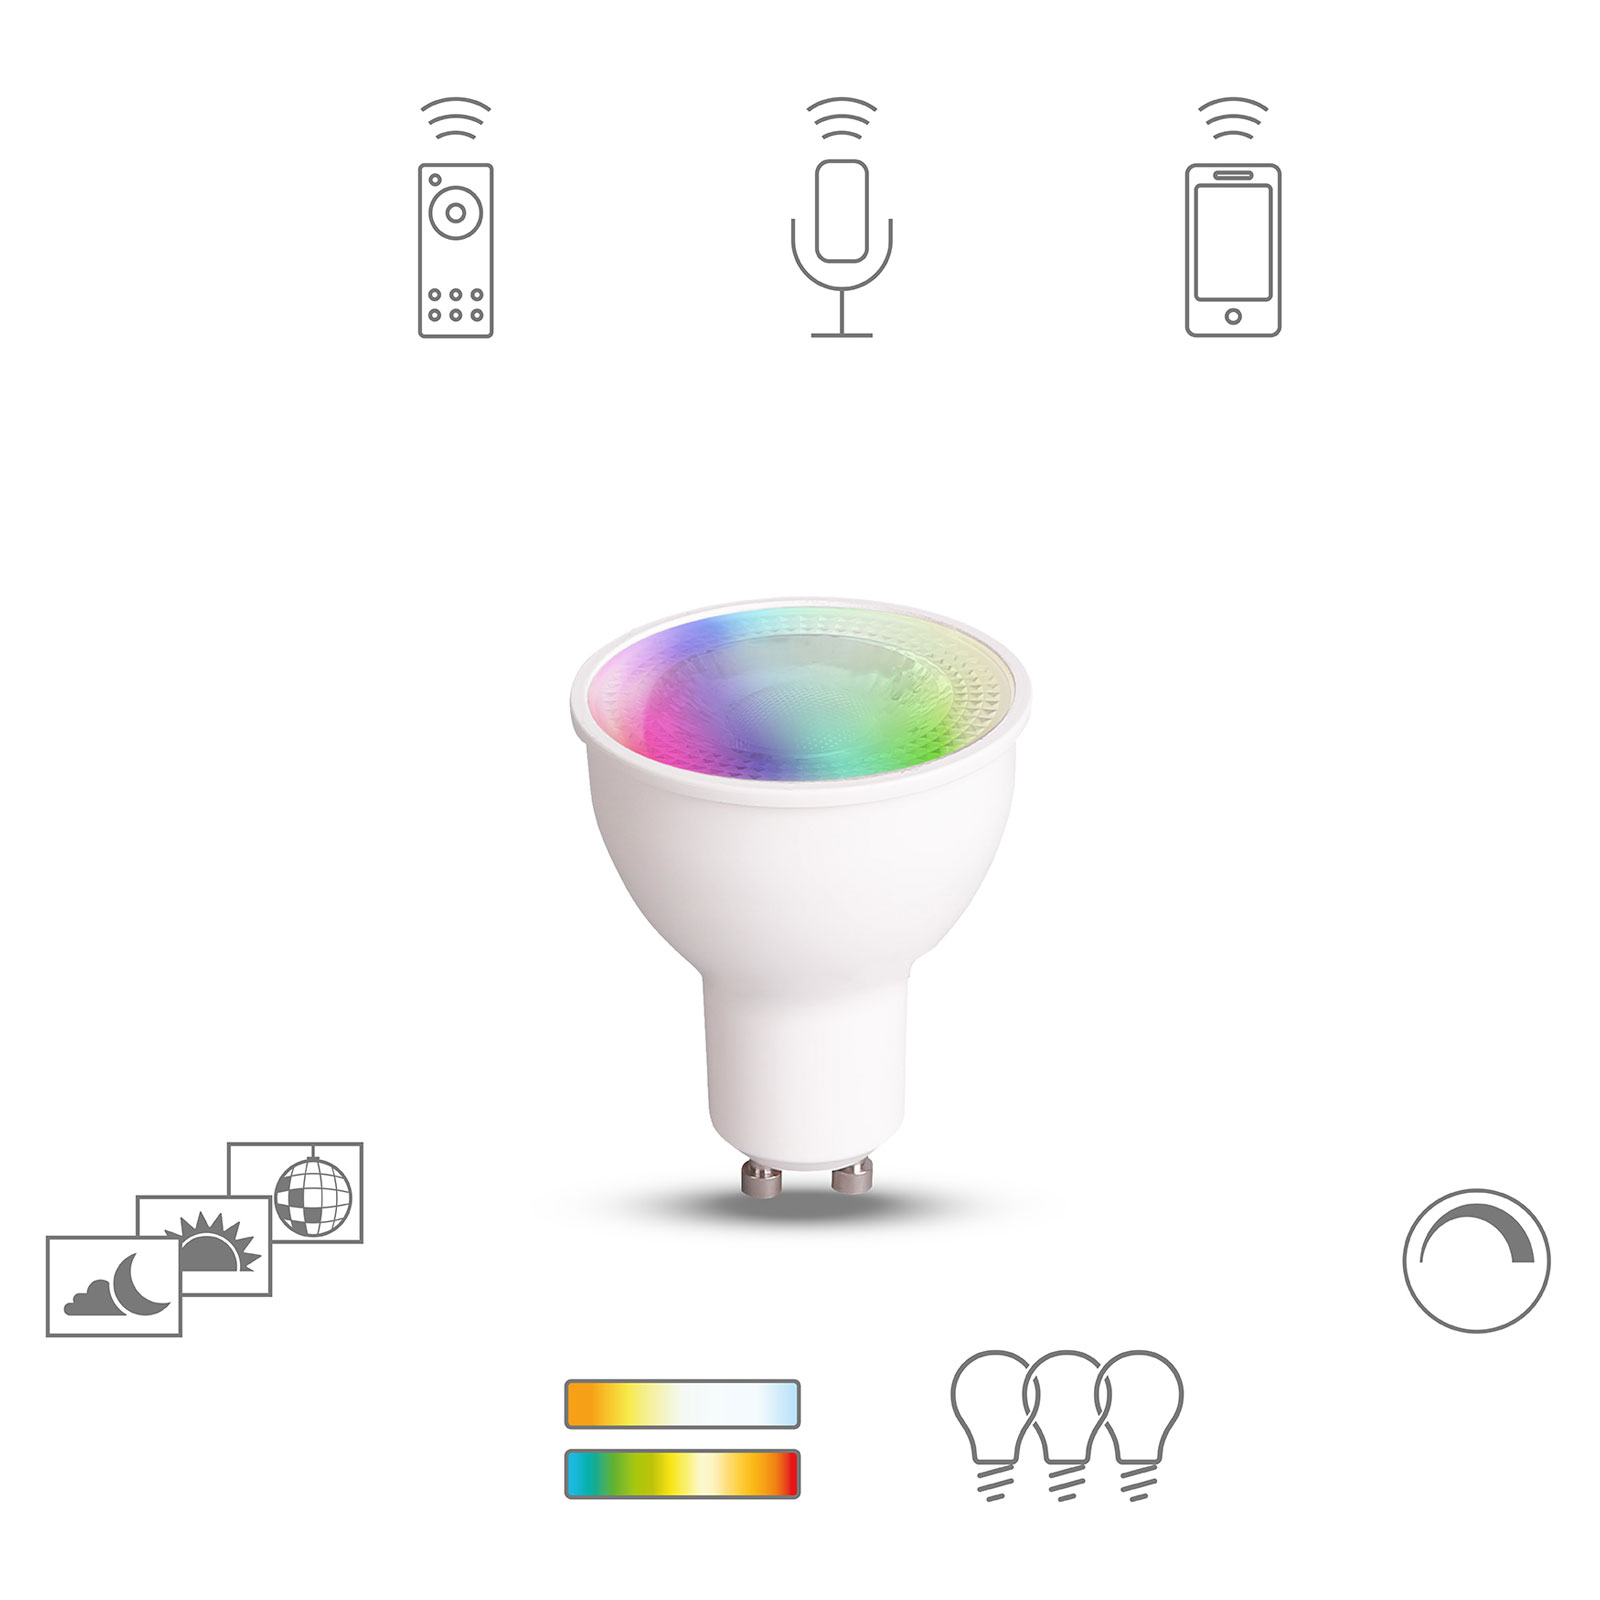 Müller Licht tint white+color LED GU10 6W 350lm